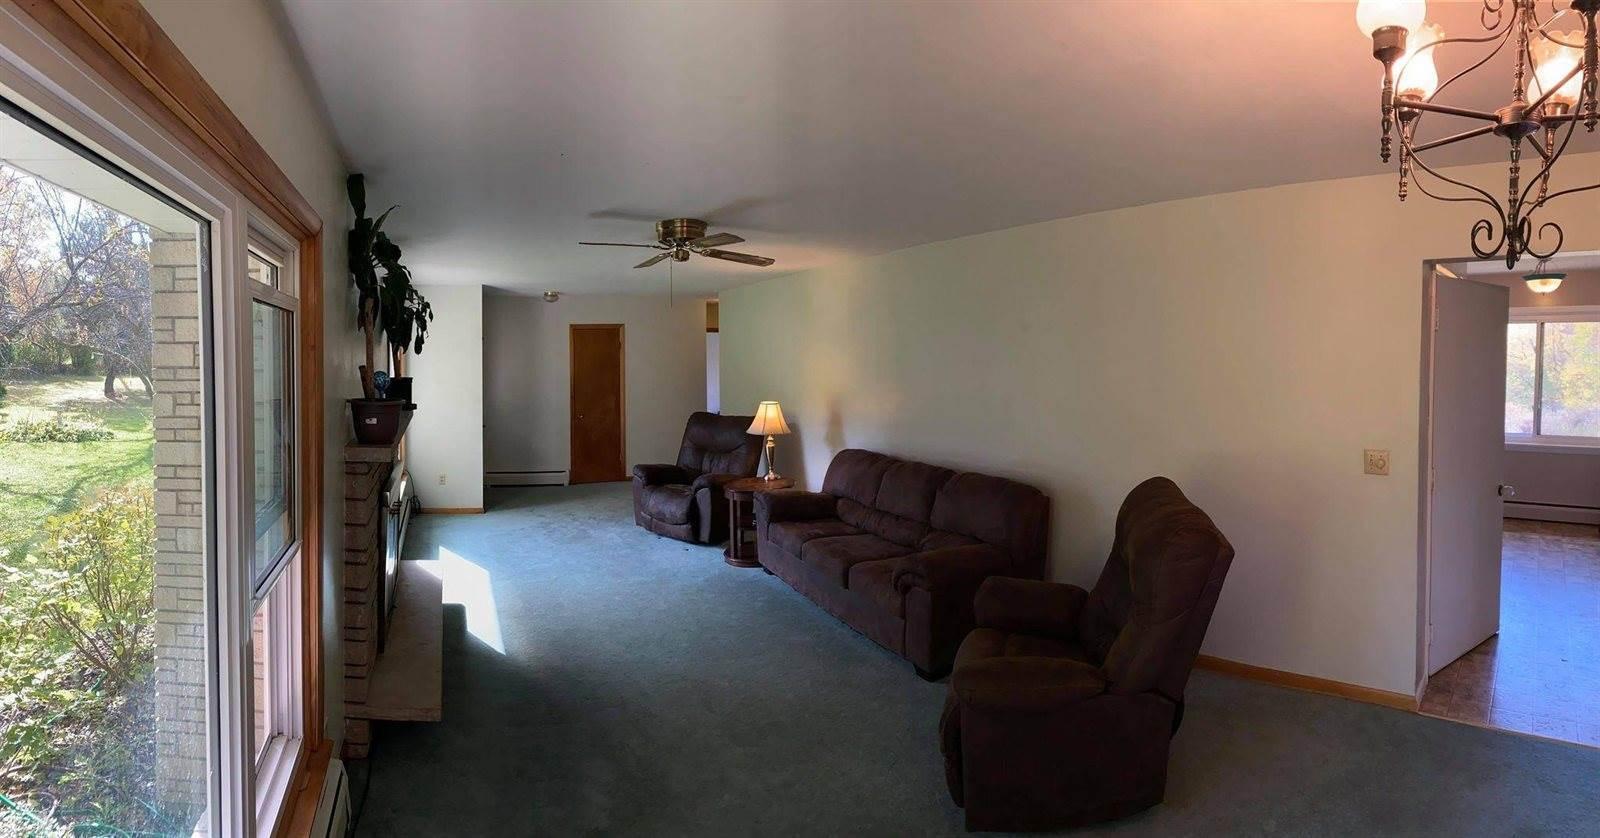 N3099 State Rd 89, Jefferson, WI 53549